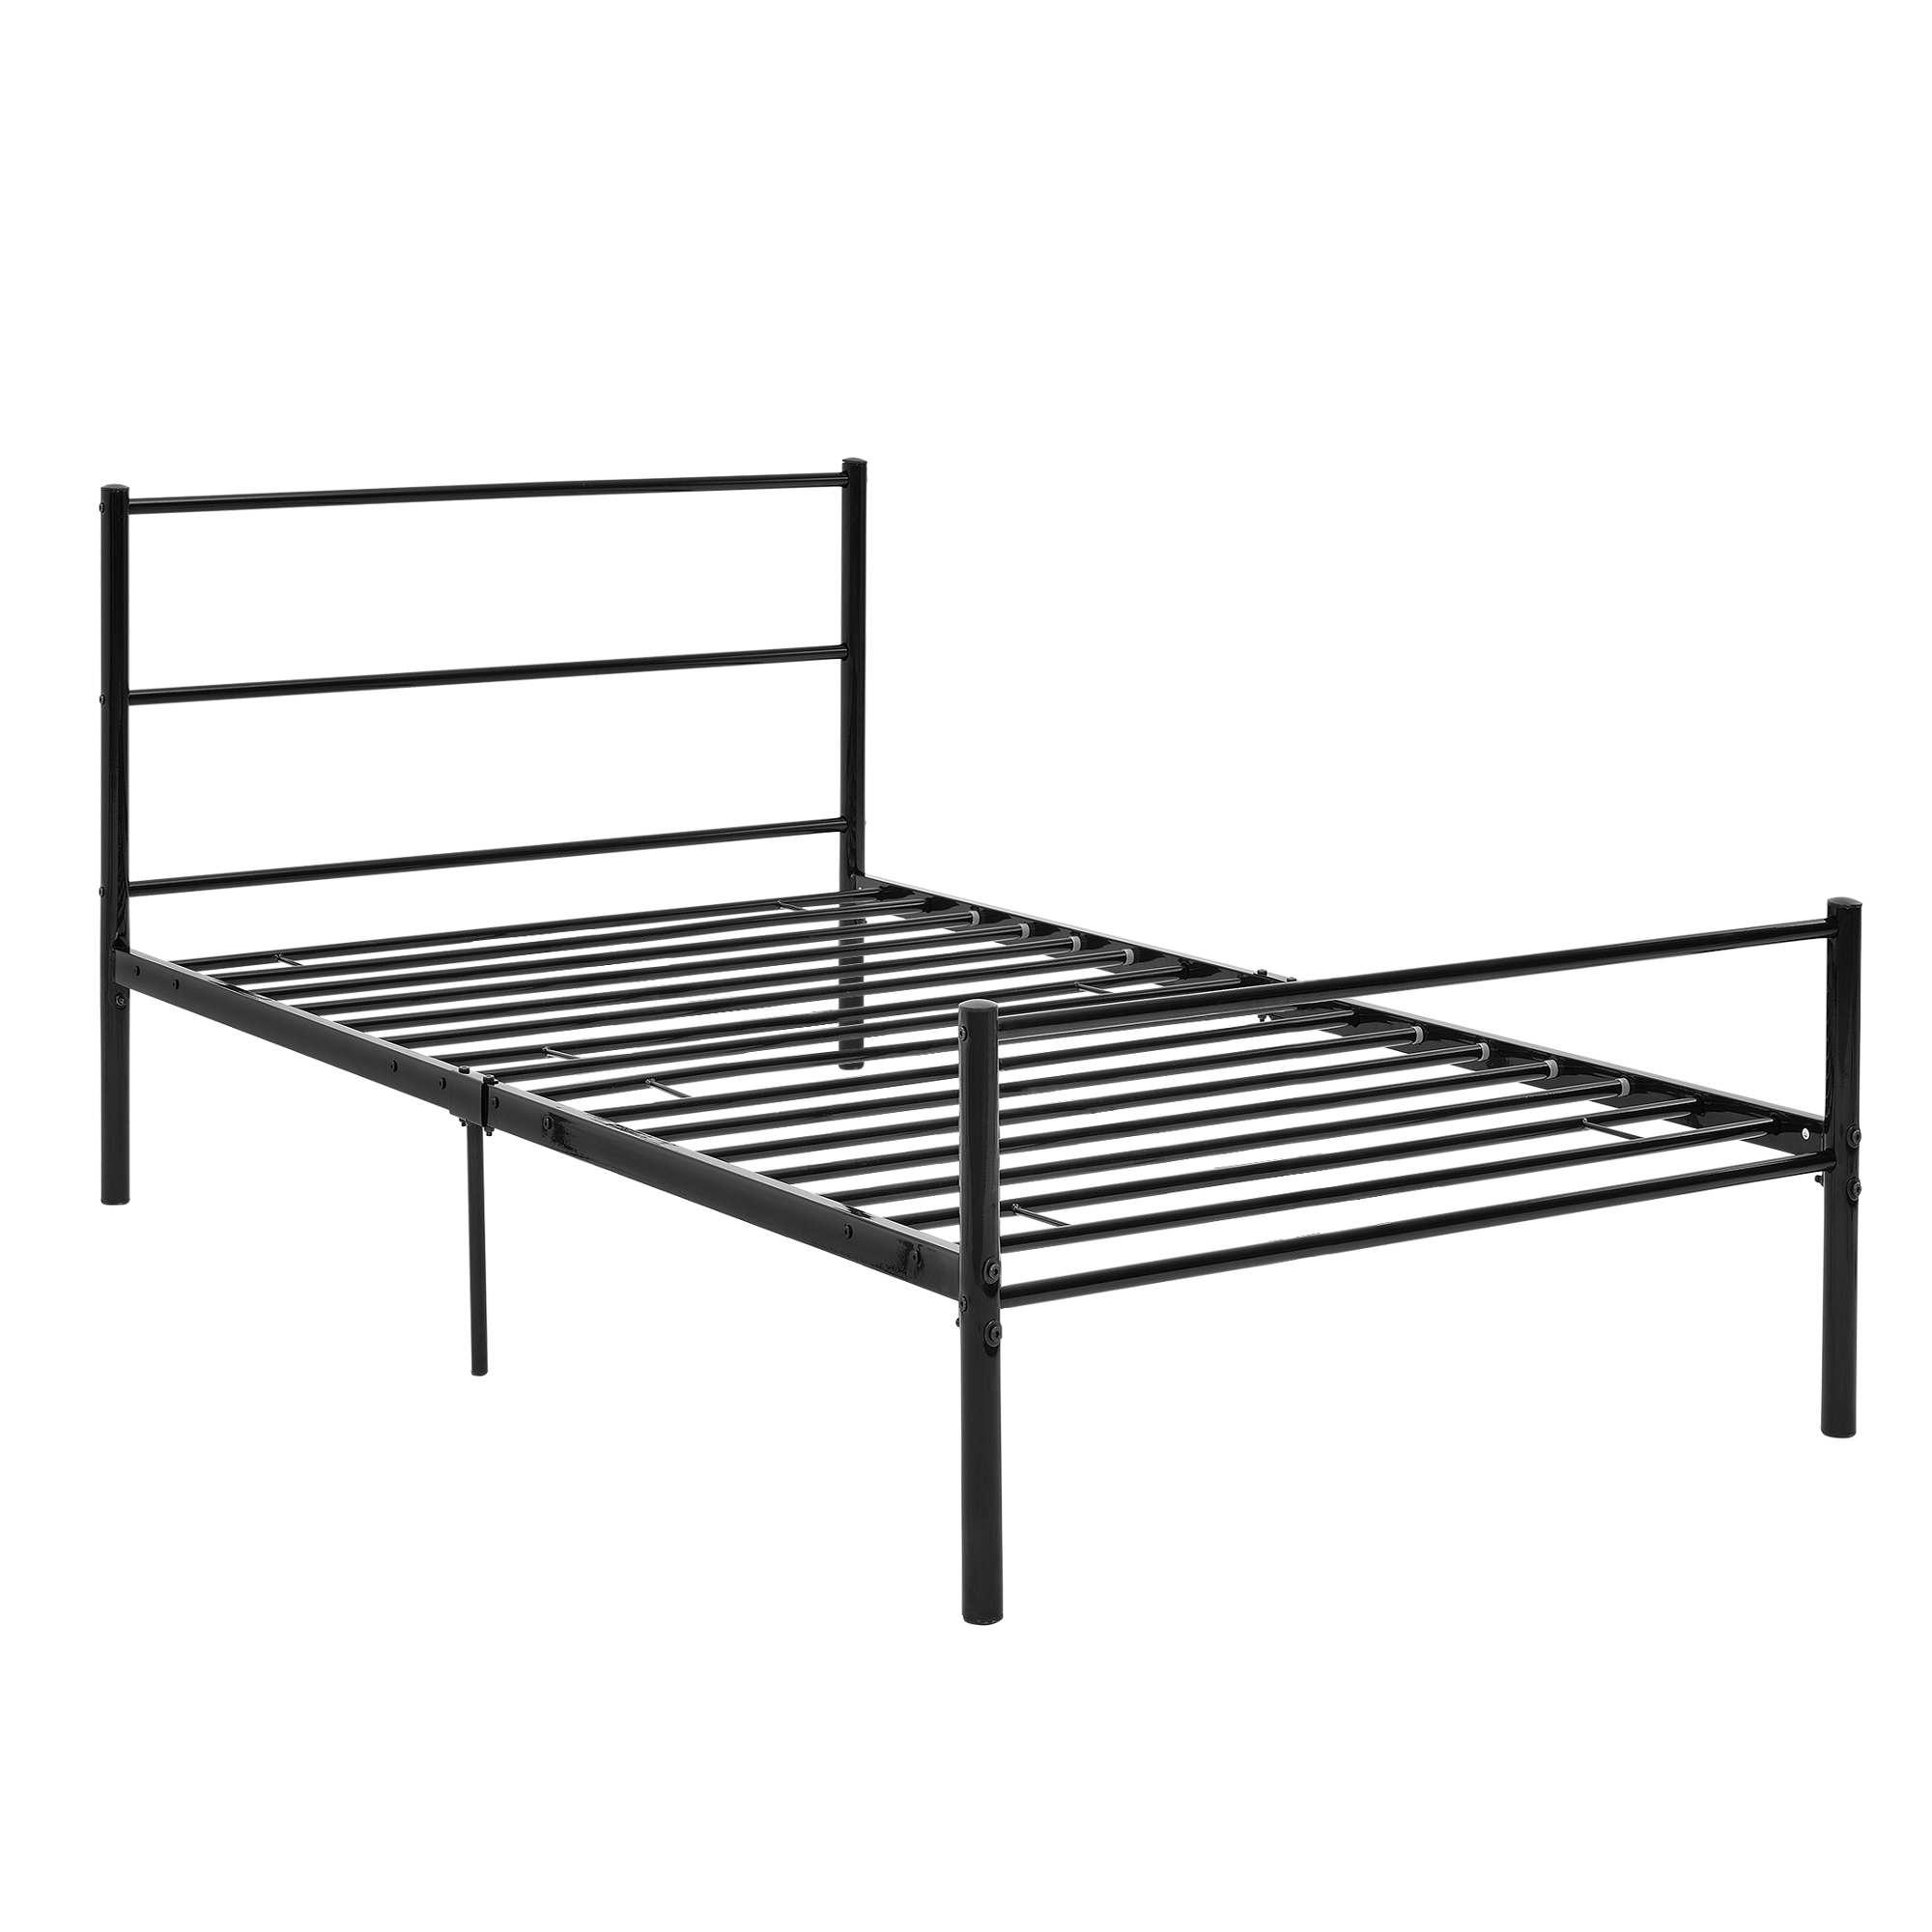 Cama de metal 90x200 negro estructura de cama cama de for Estructura cama 90x200